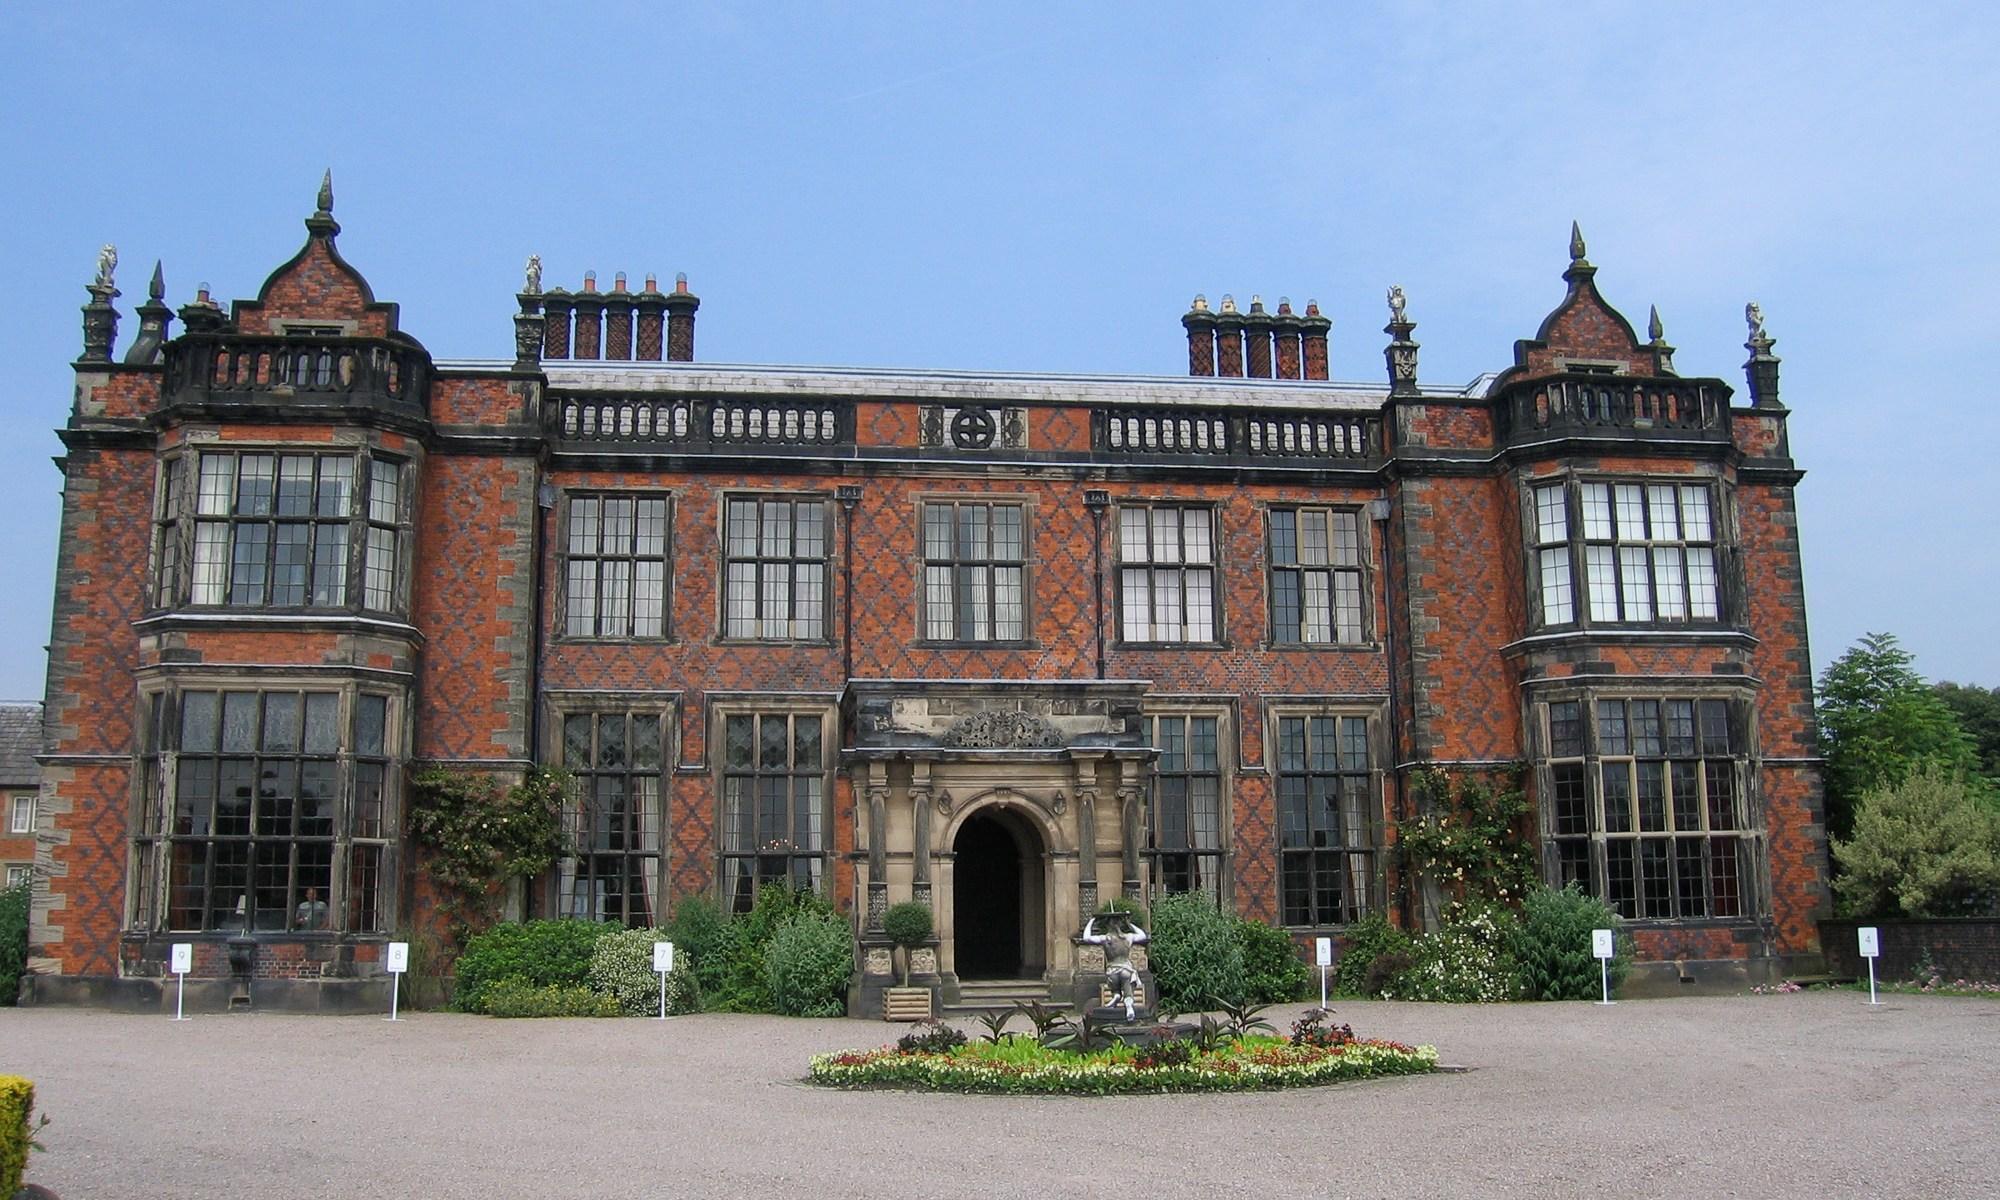 Arley Hall - Cheshire